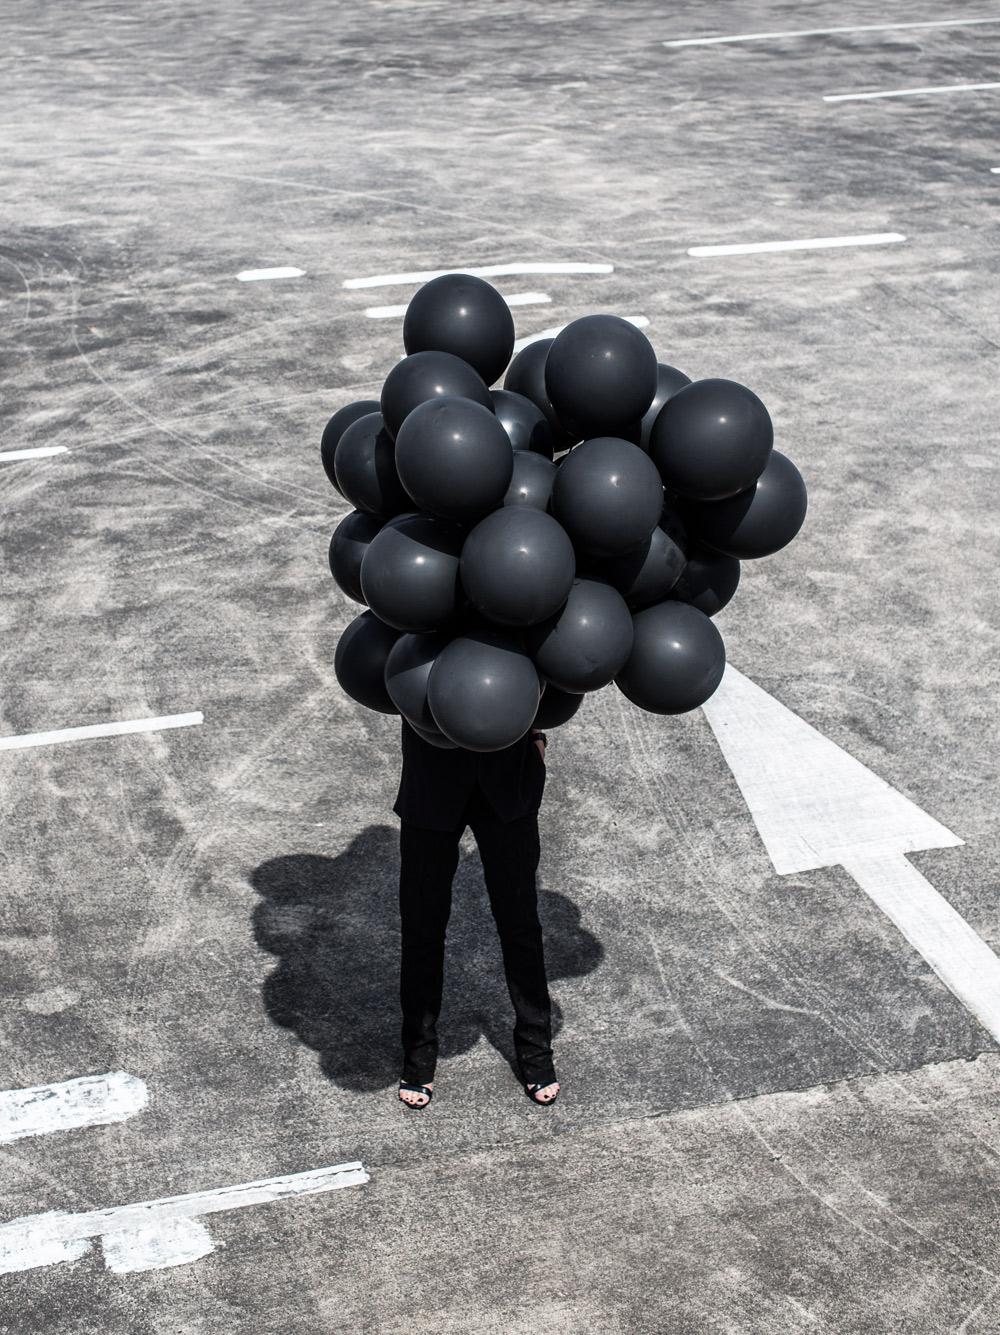 Black Balloons, Black Suit, Bloglovin Awards, Oracle Fox, amanda Shadforth, carpark